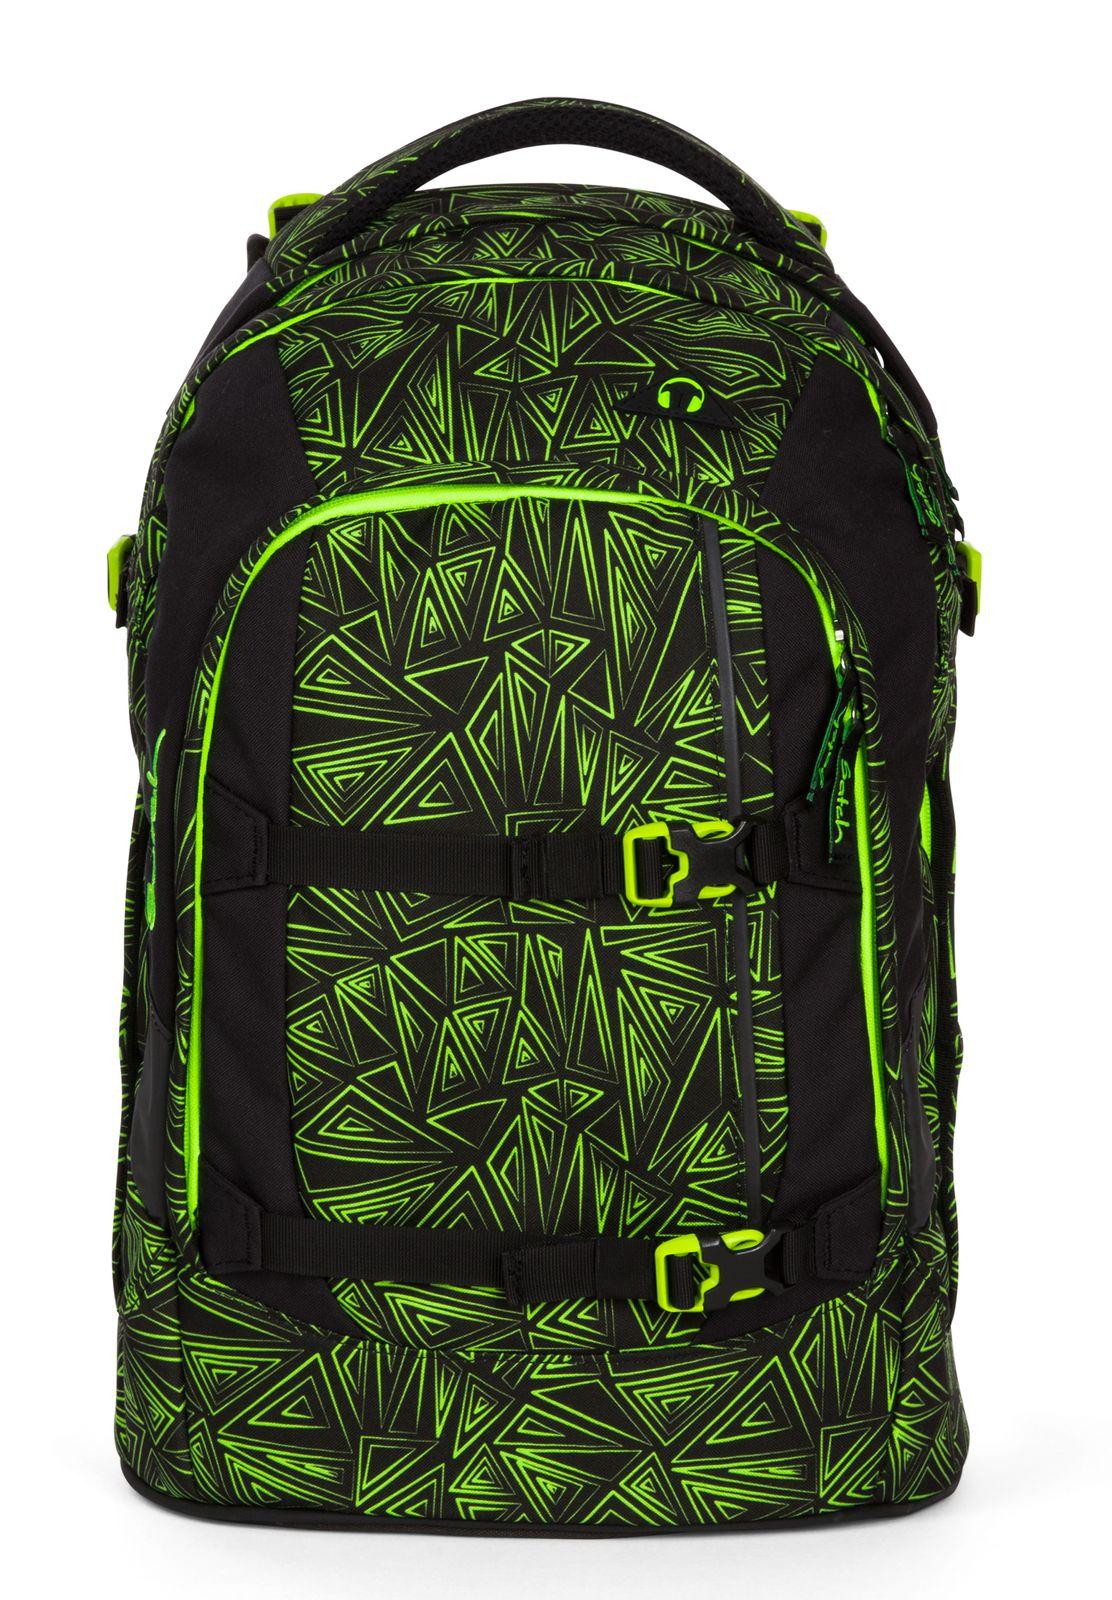 5524d04528cf8 satch Pack Schulranzen Rucksack Schulrucksack Tasche Green Bermuda ...